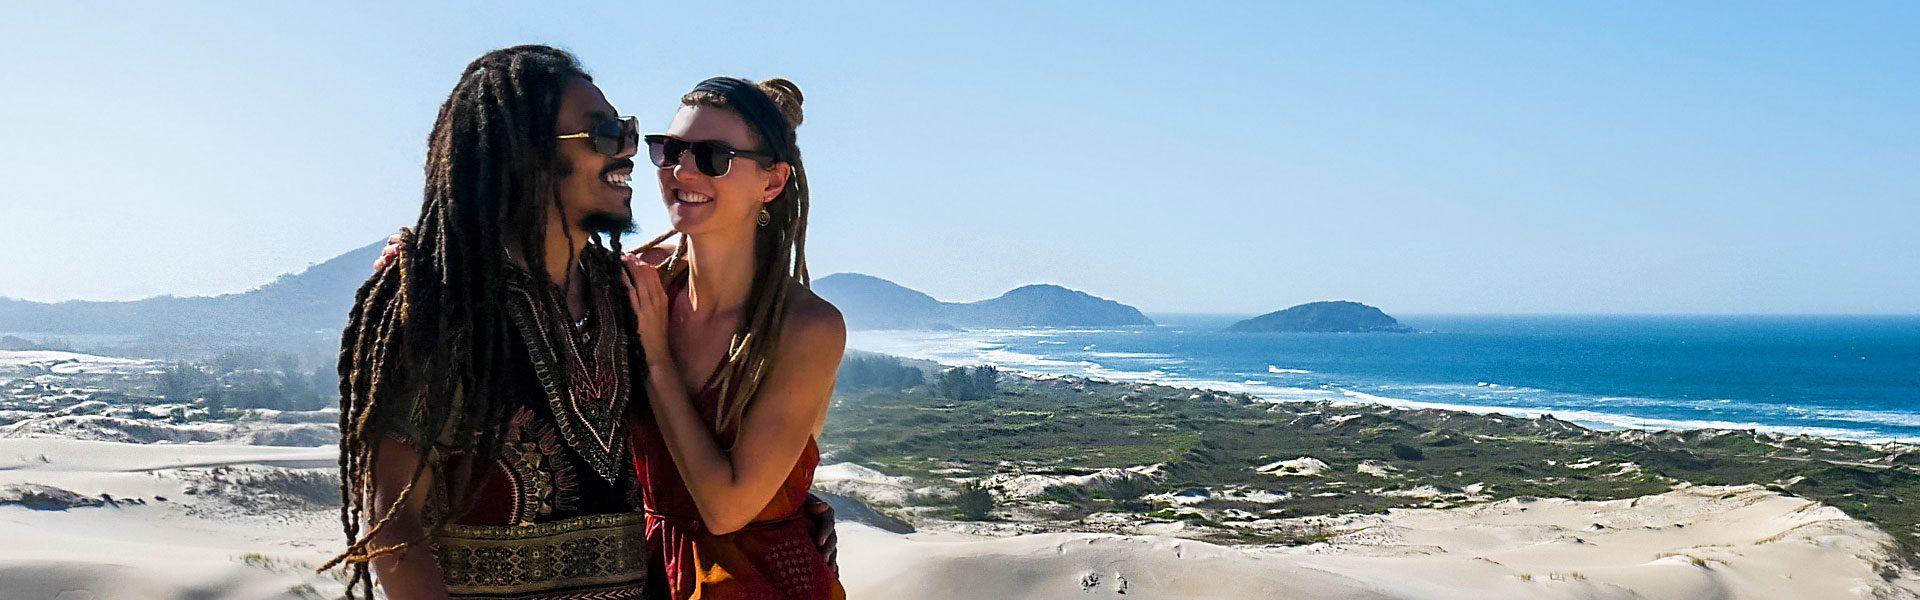 Rasta couple laughing in Dunas da Ribanceira with ocean view in Imbituba, Brazil